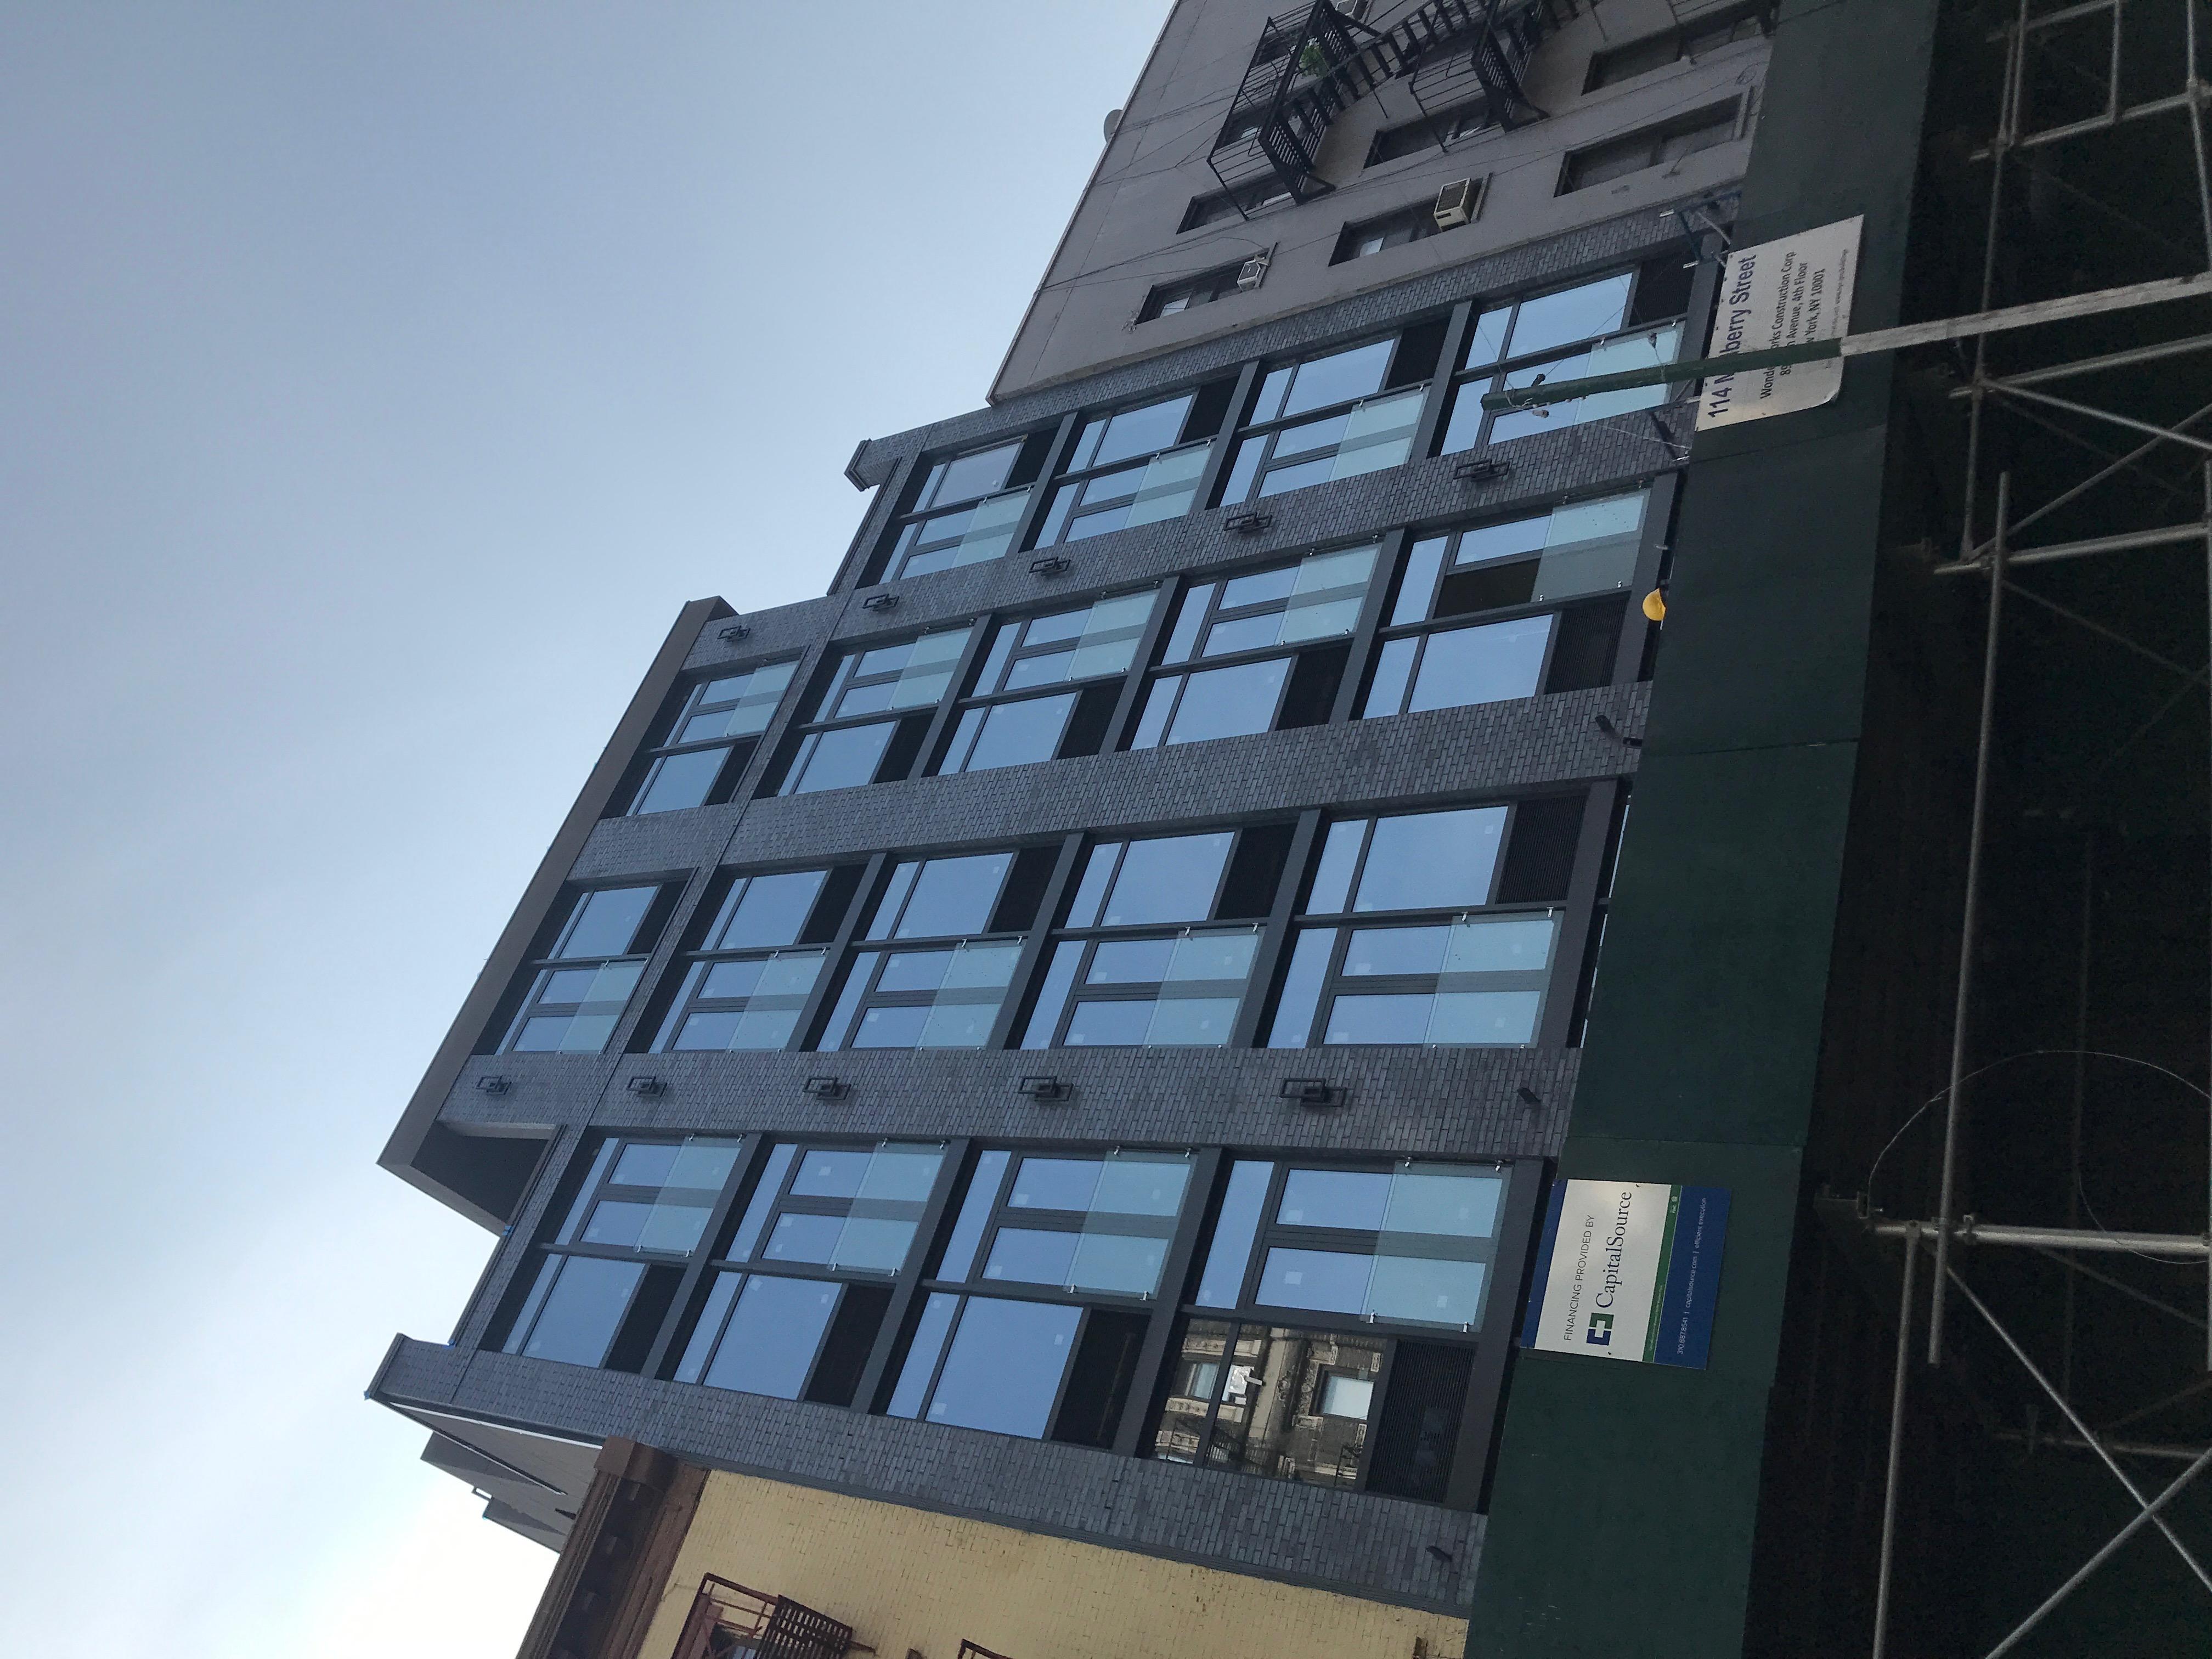 114 Mulberry Street - Parioli - Facade